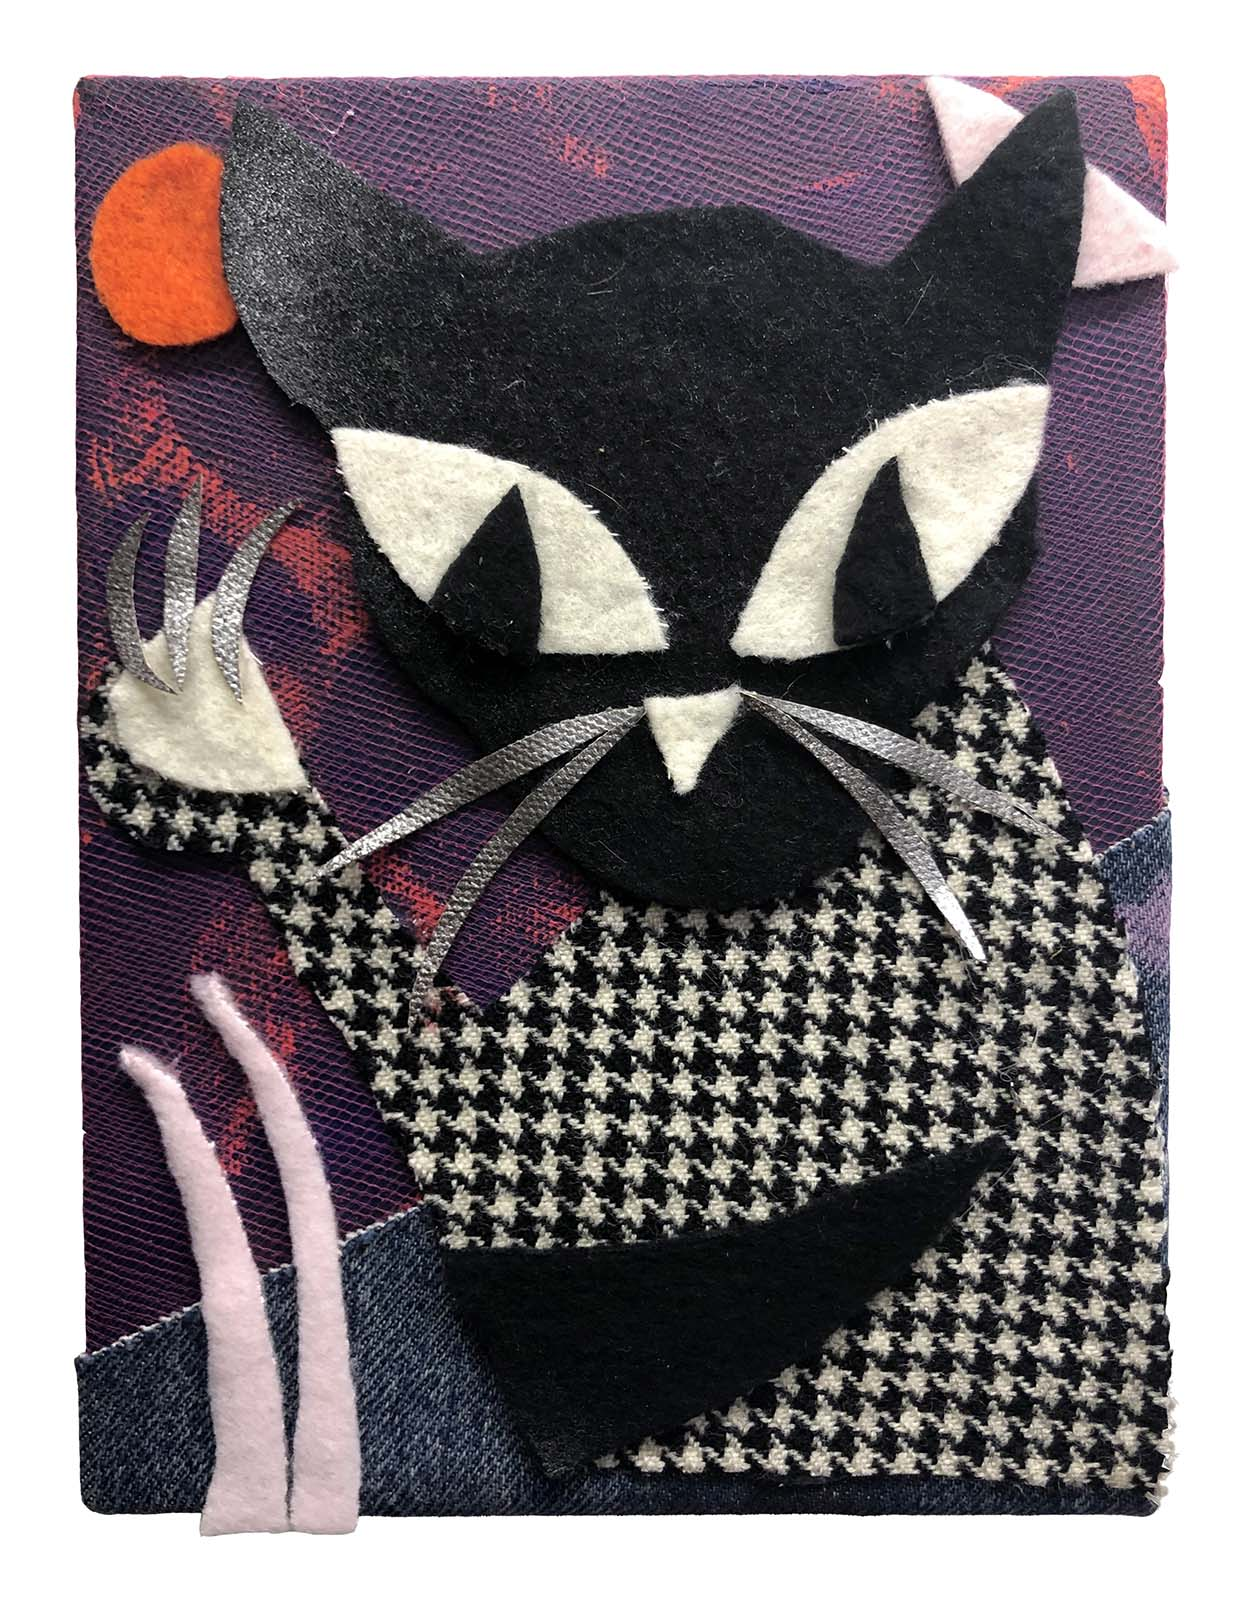 Chris Williford, Houndstooth Kitty at Sunset (2019), Fleece, felt, tulle, and acrylic on canvas